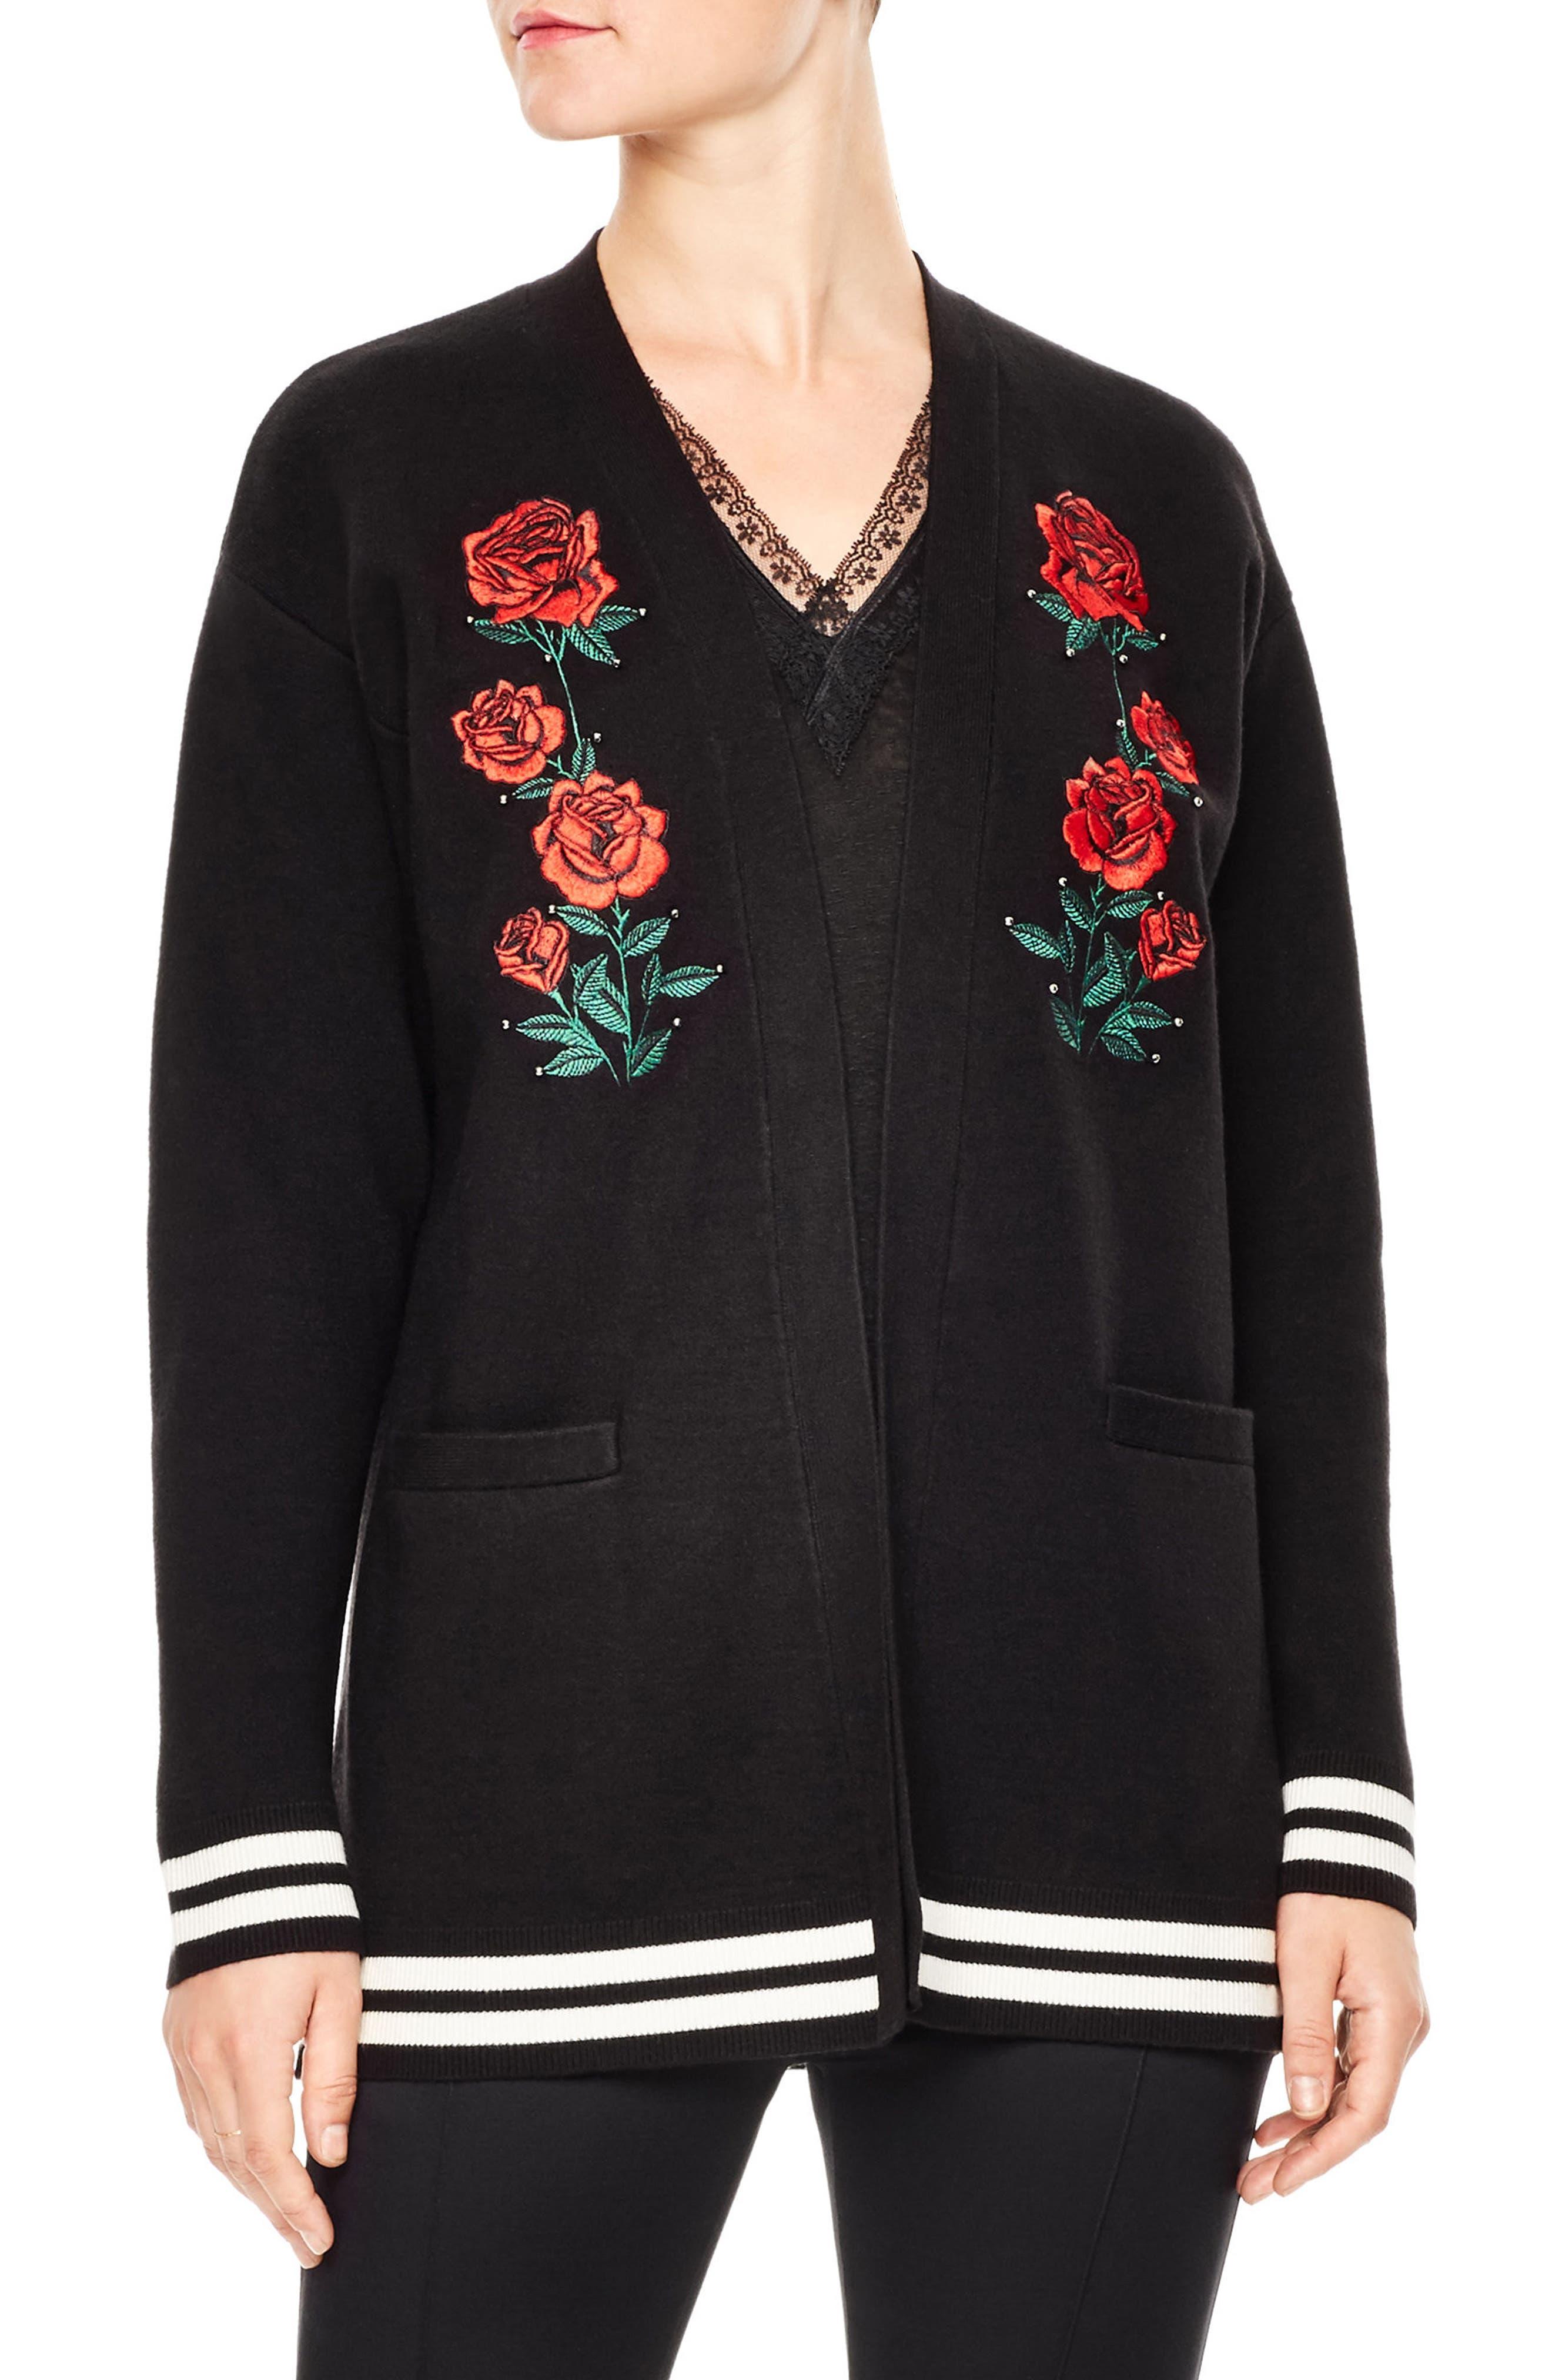 Gorka Embroidered Cardigan,                         Main,                         color, Black